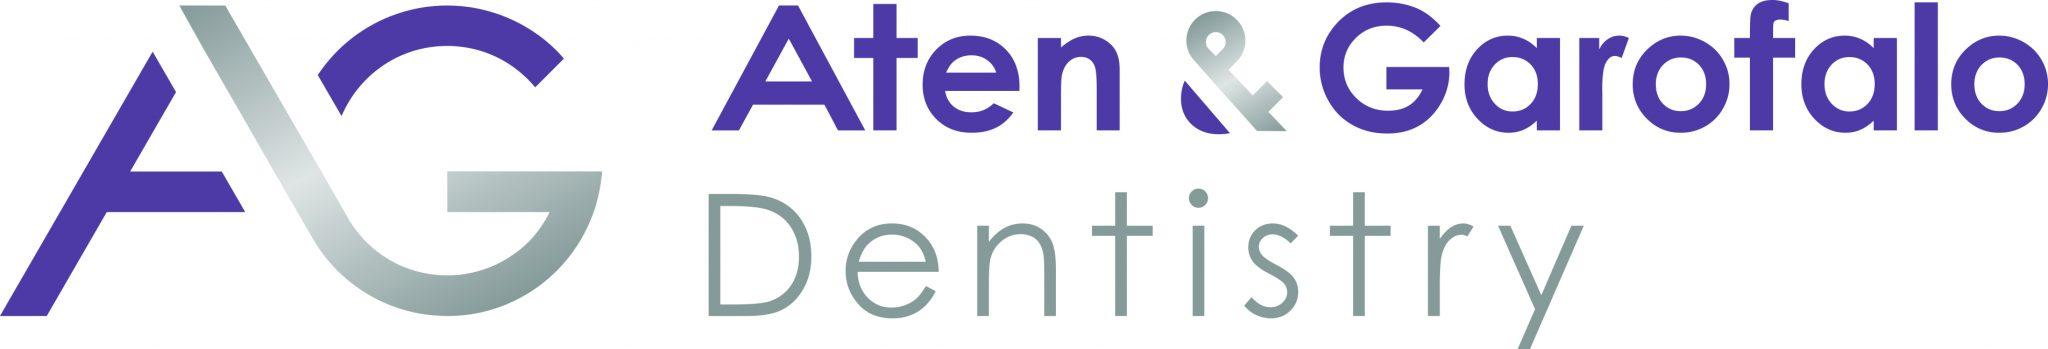 Aten & Garofalo Logo-CMYK copy